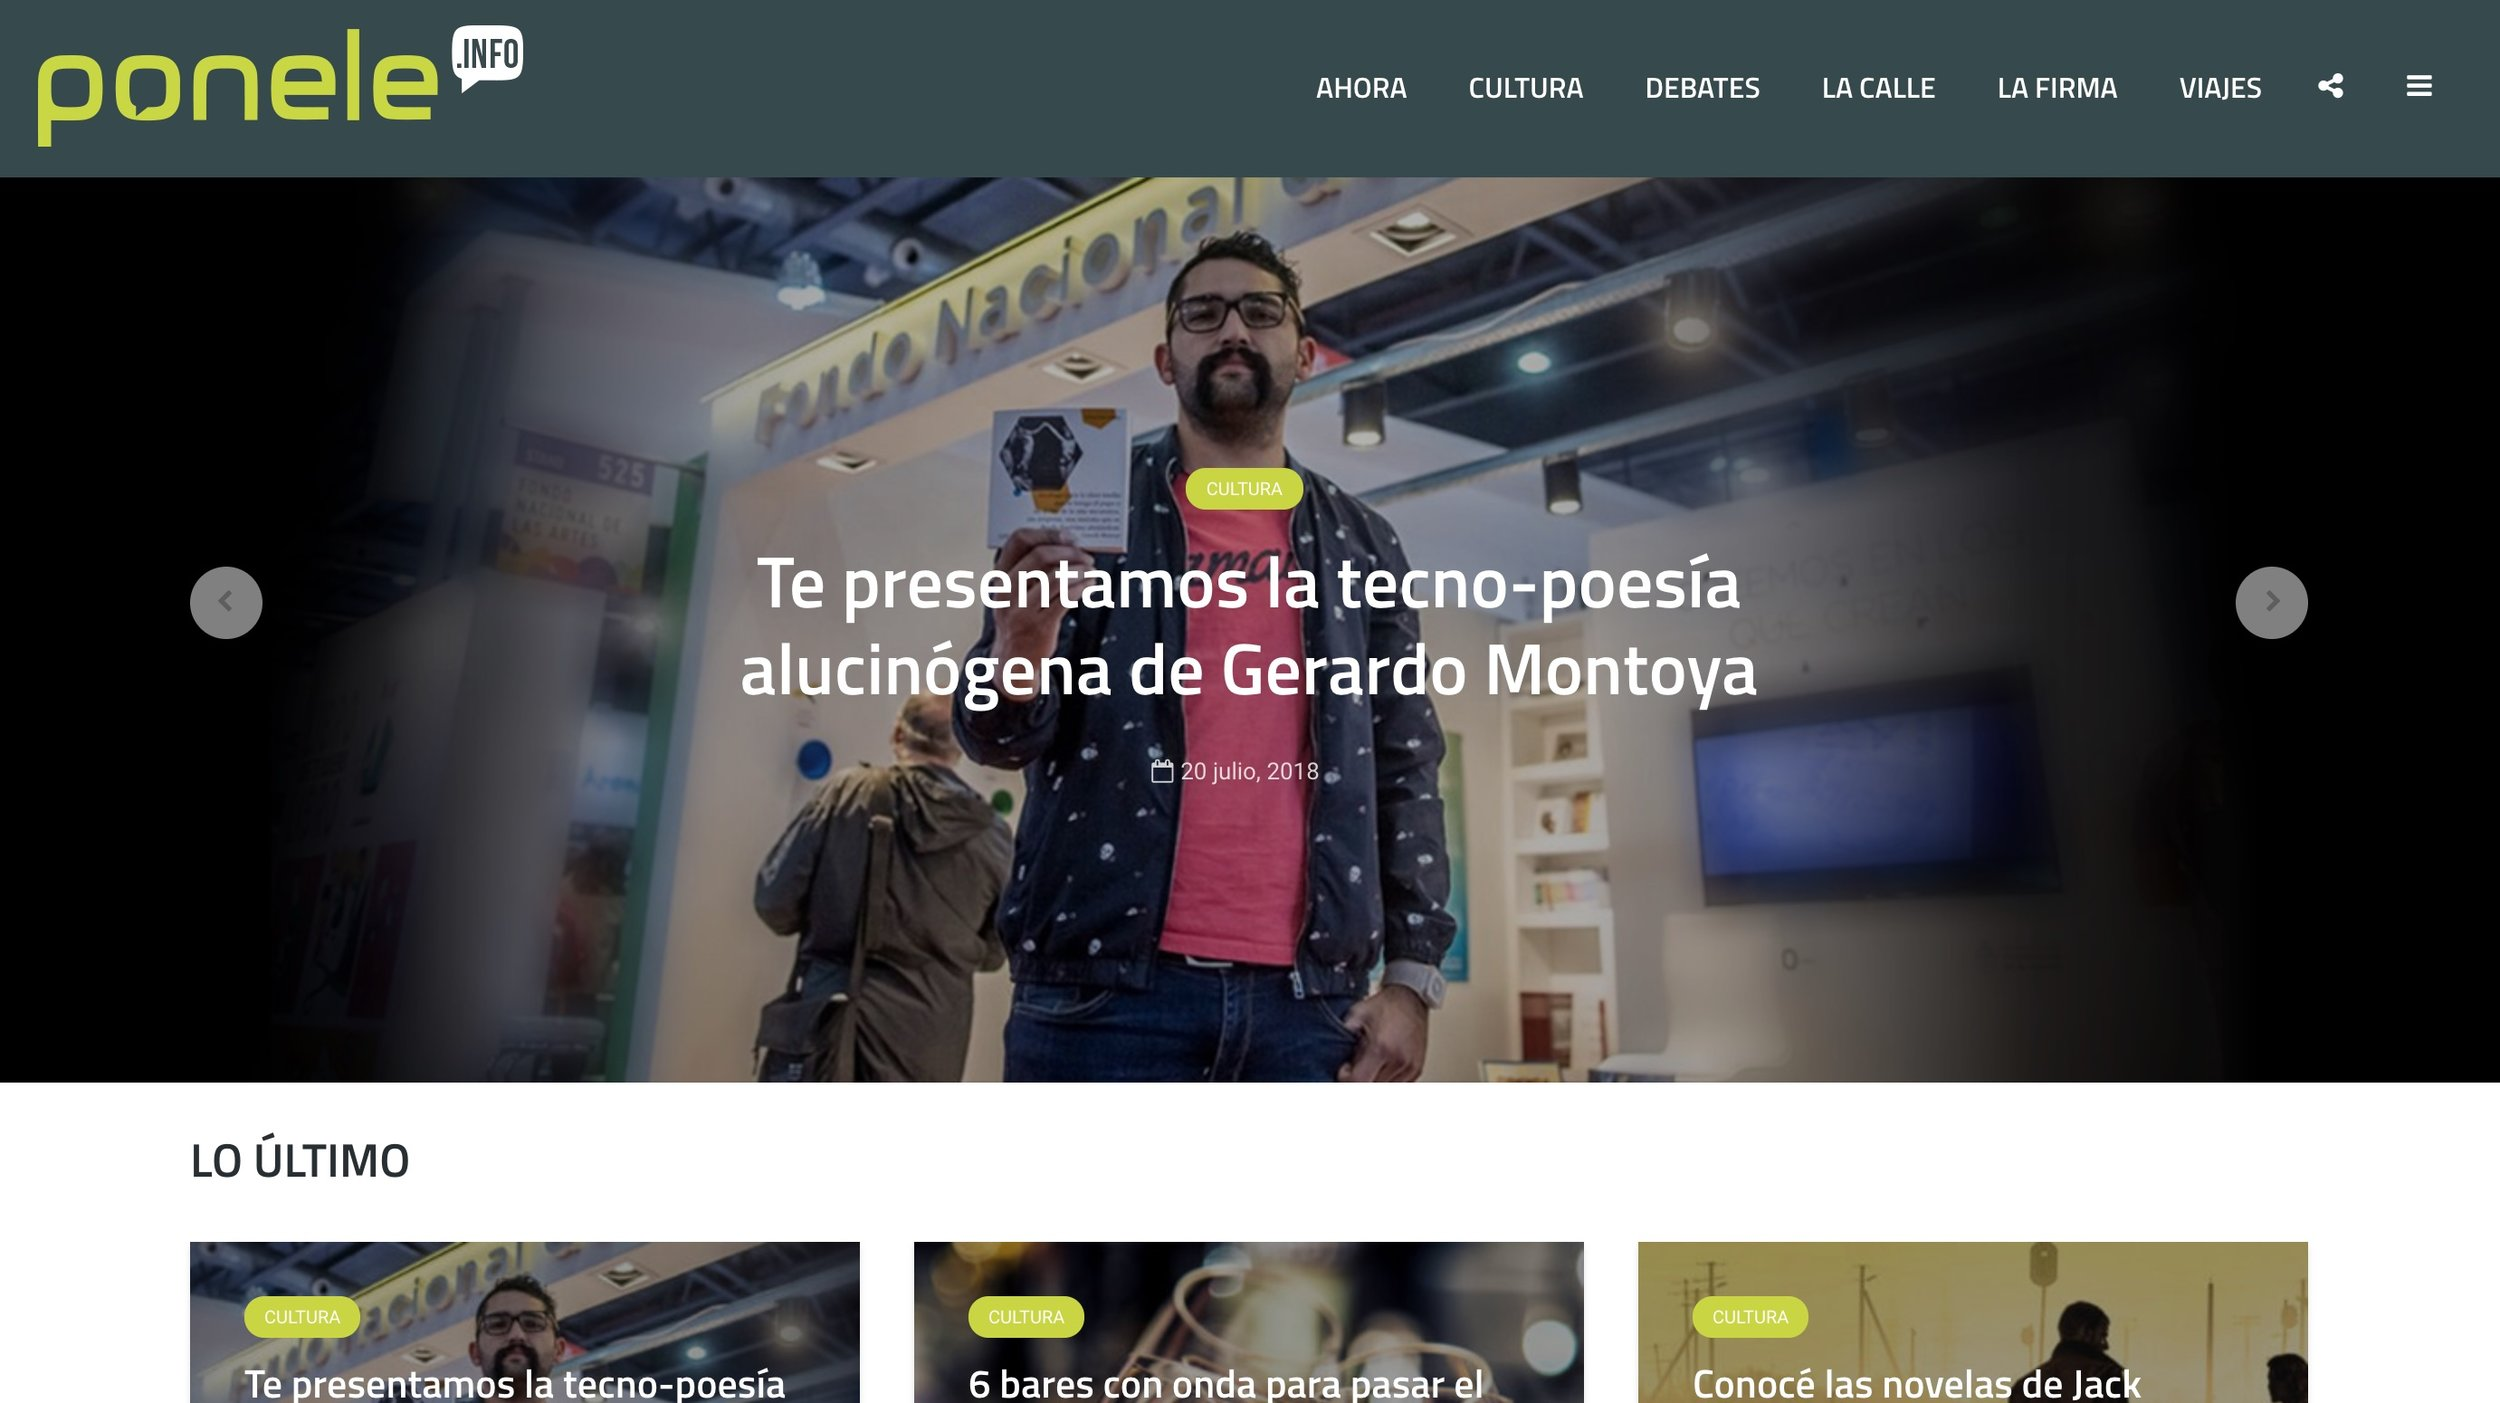 reseña en ponele.info - por Hernán Vanoli